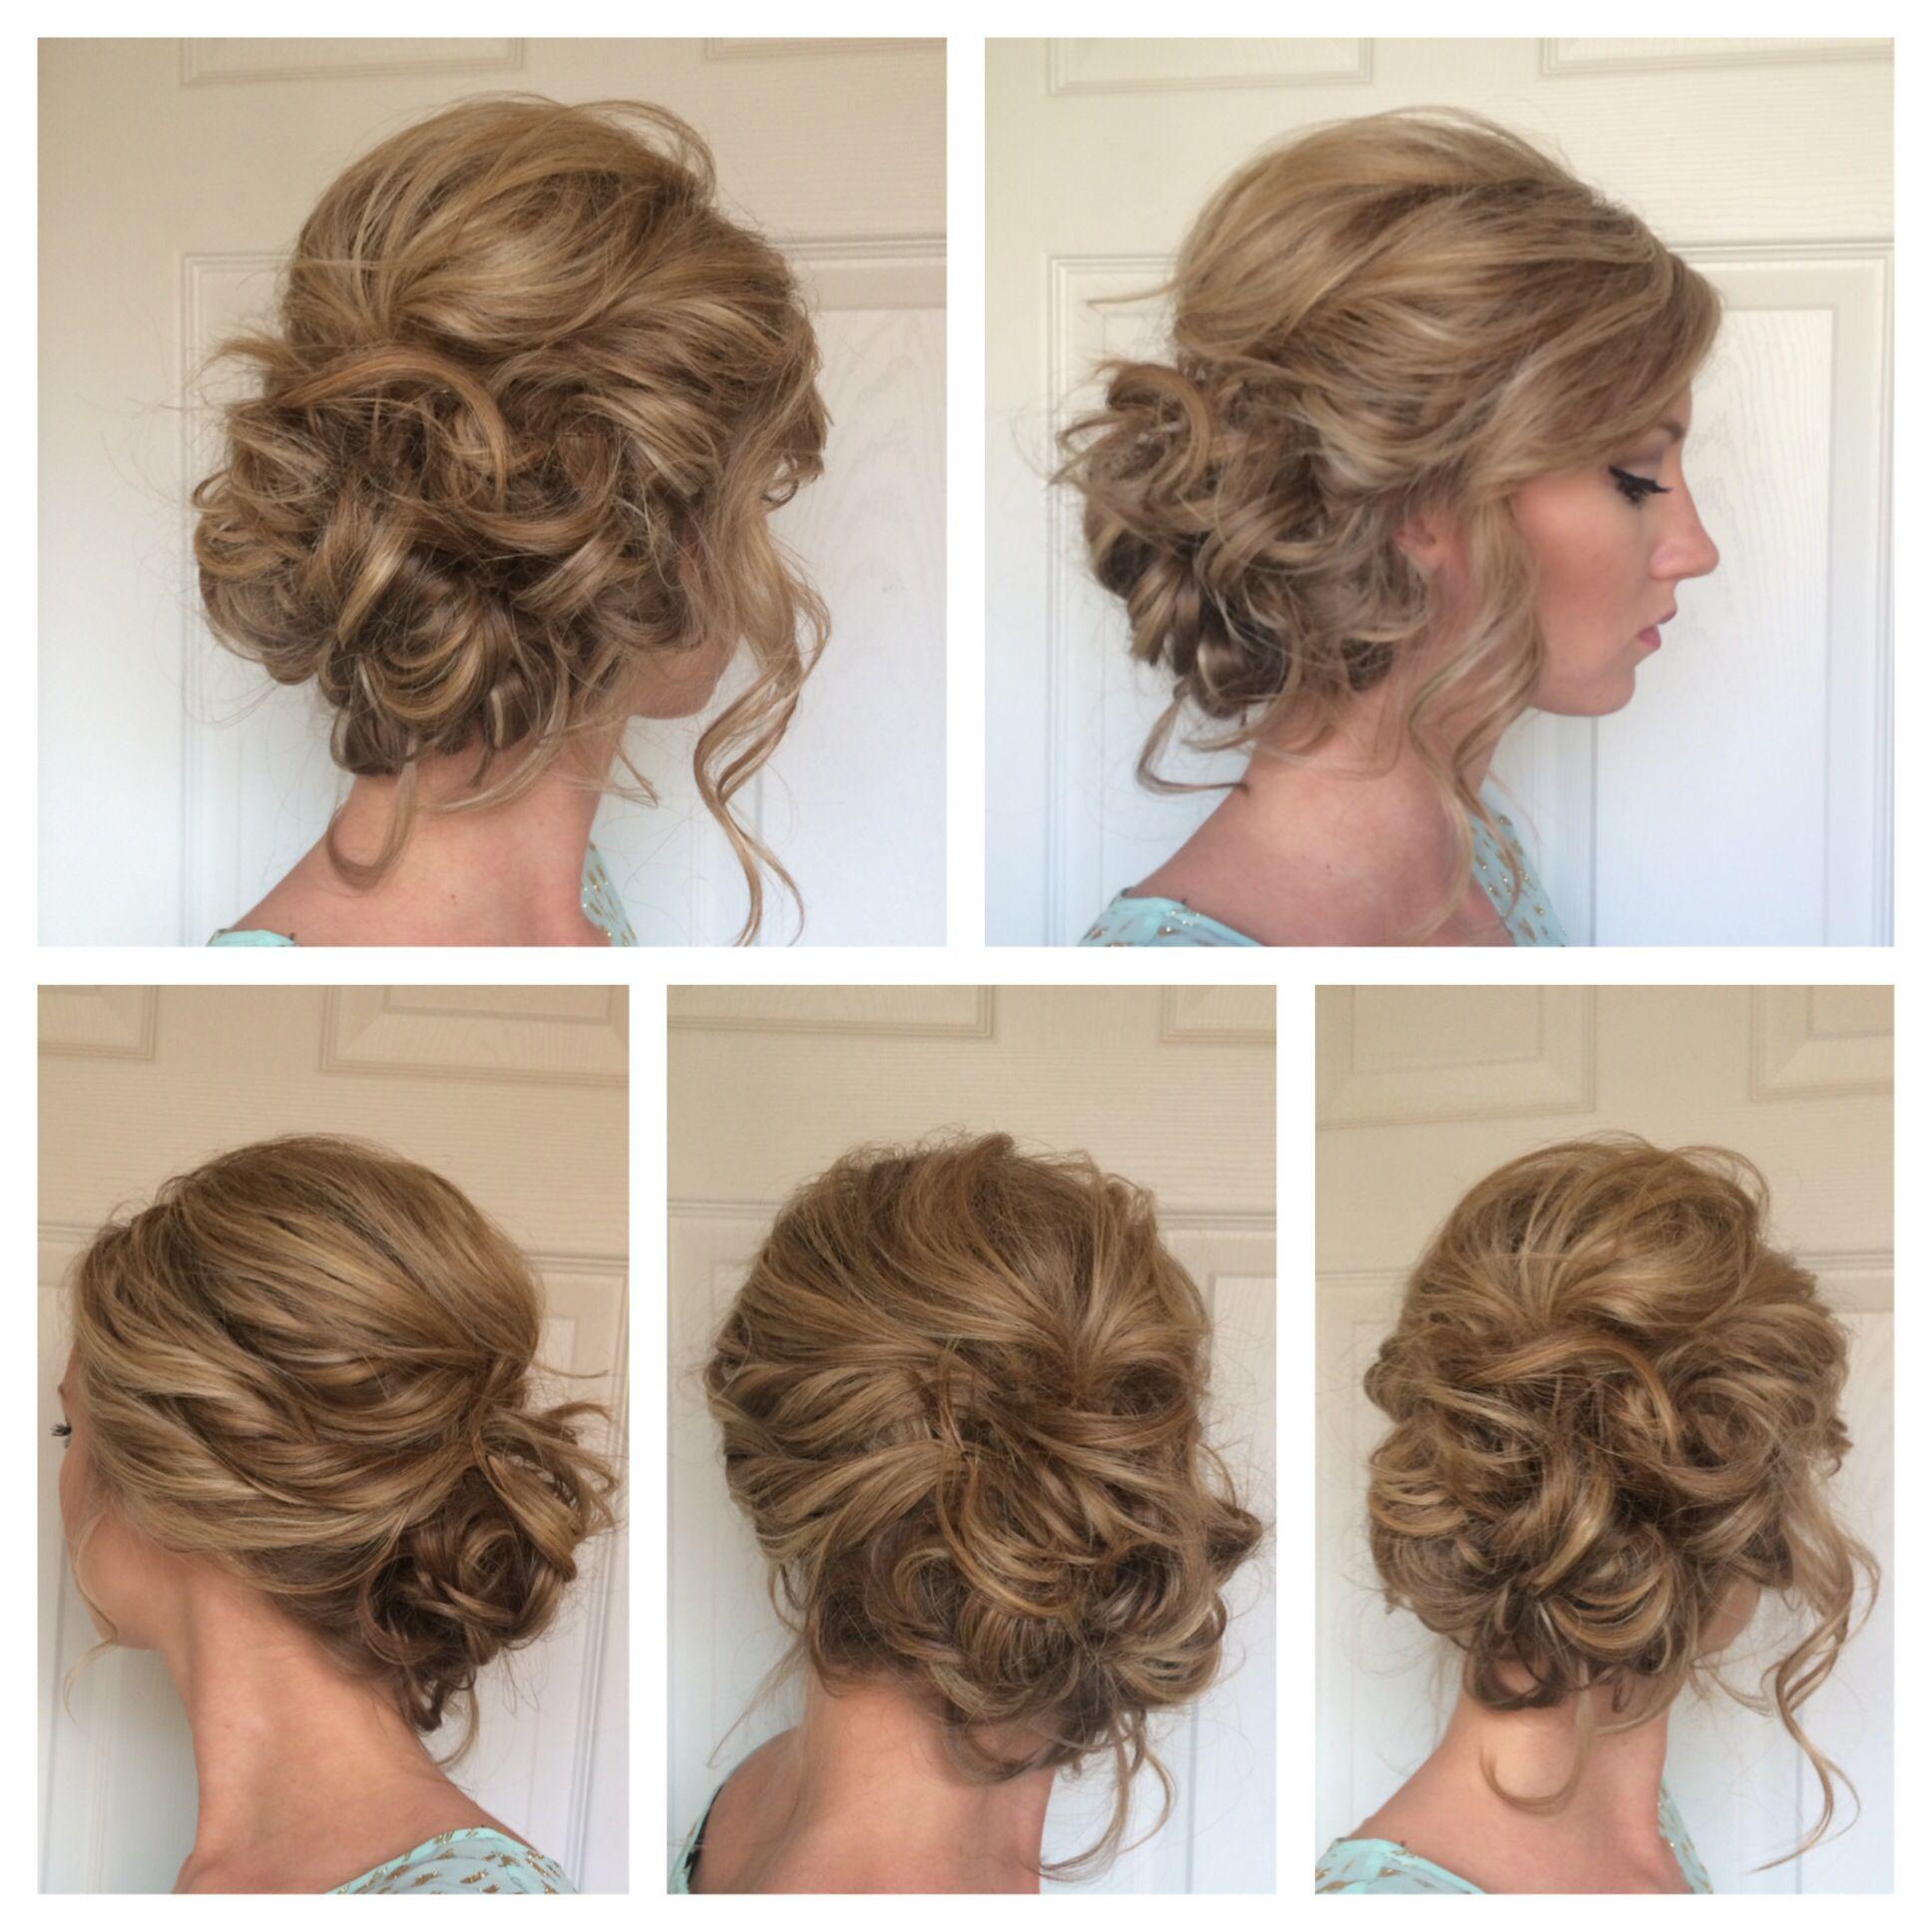 Side updo jessicabmelton pentinats pinterest updo hair